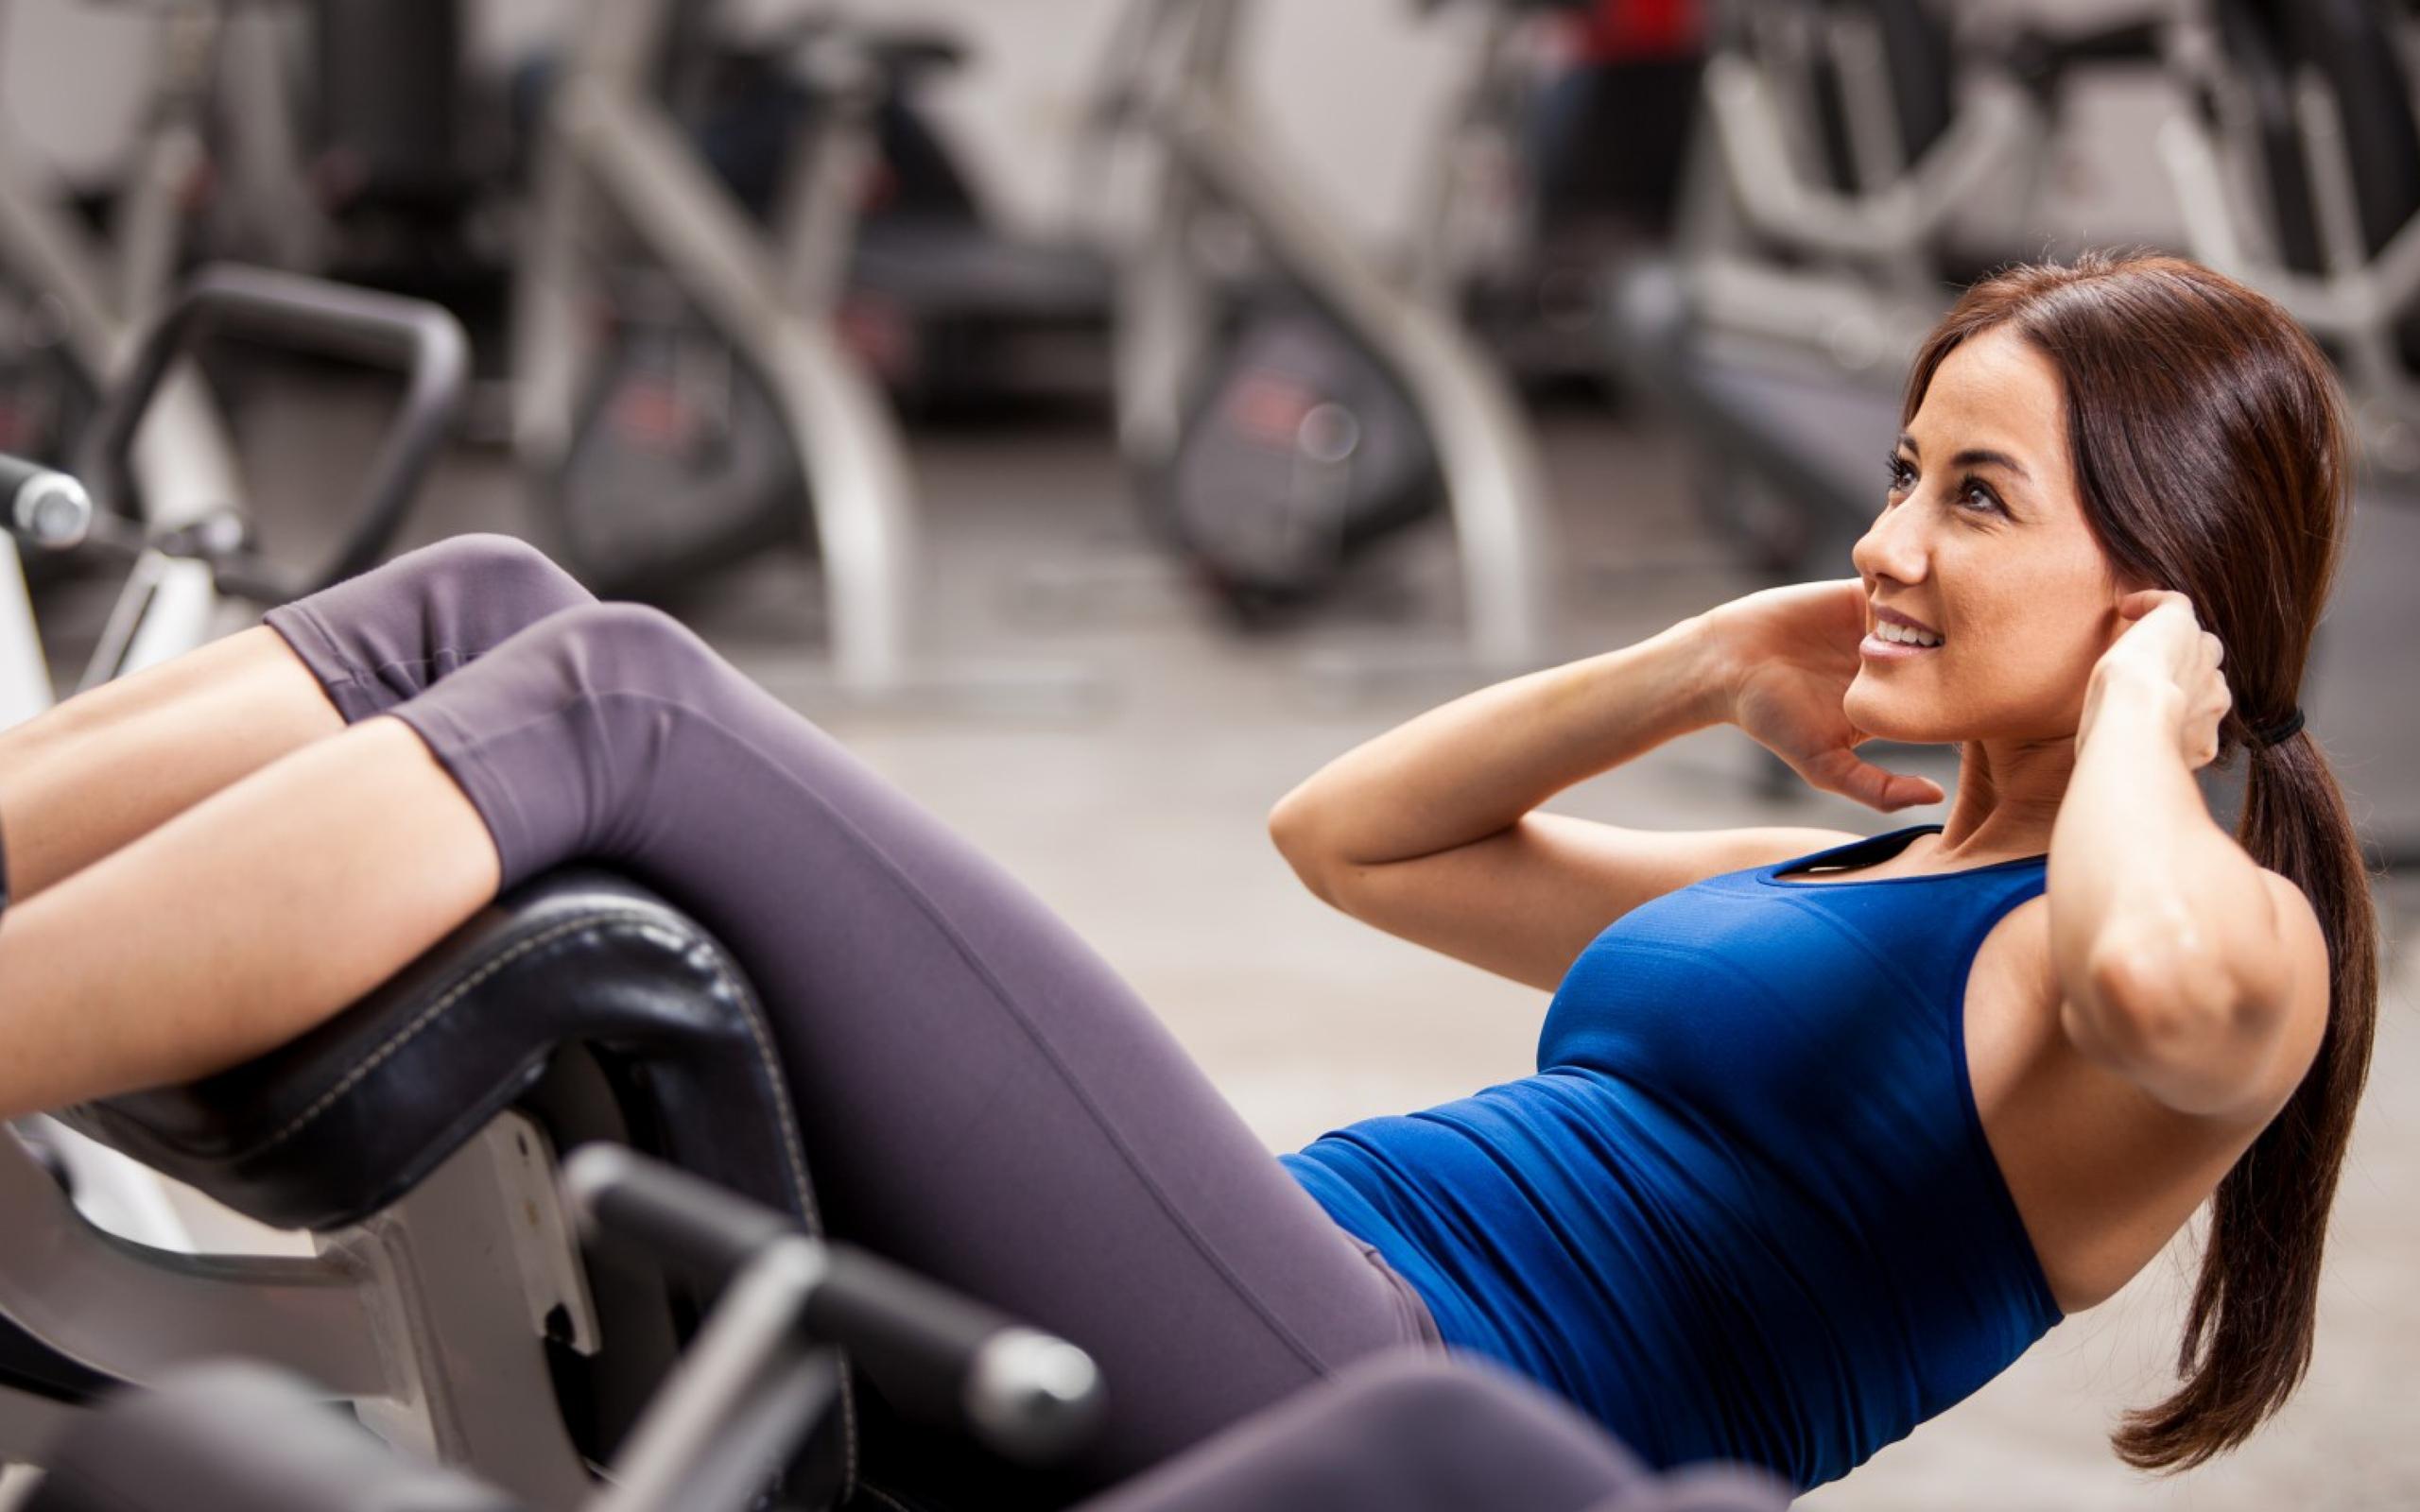 2560x1600 Gym Girl 2560x1600 Resolution HD 4k Wallpapers